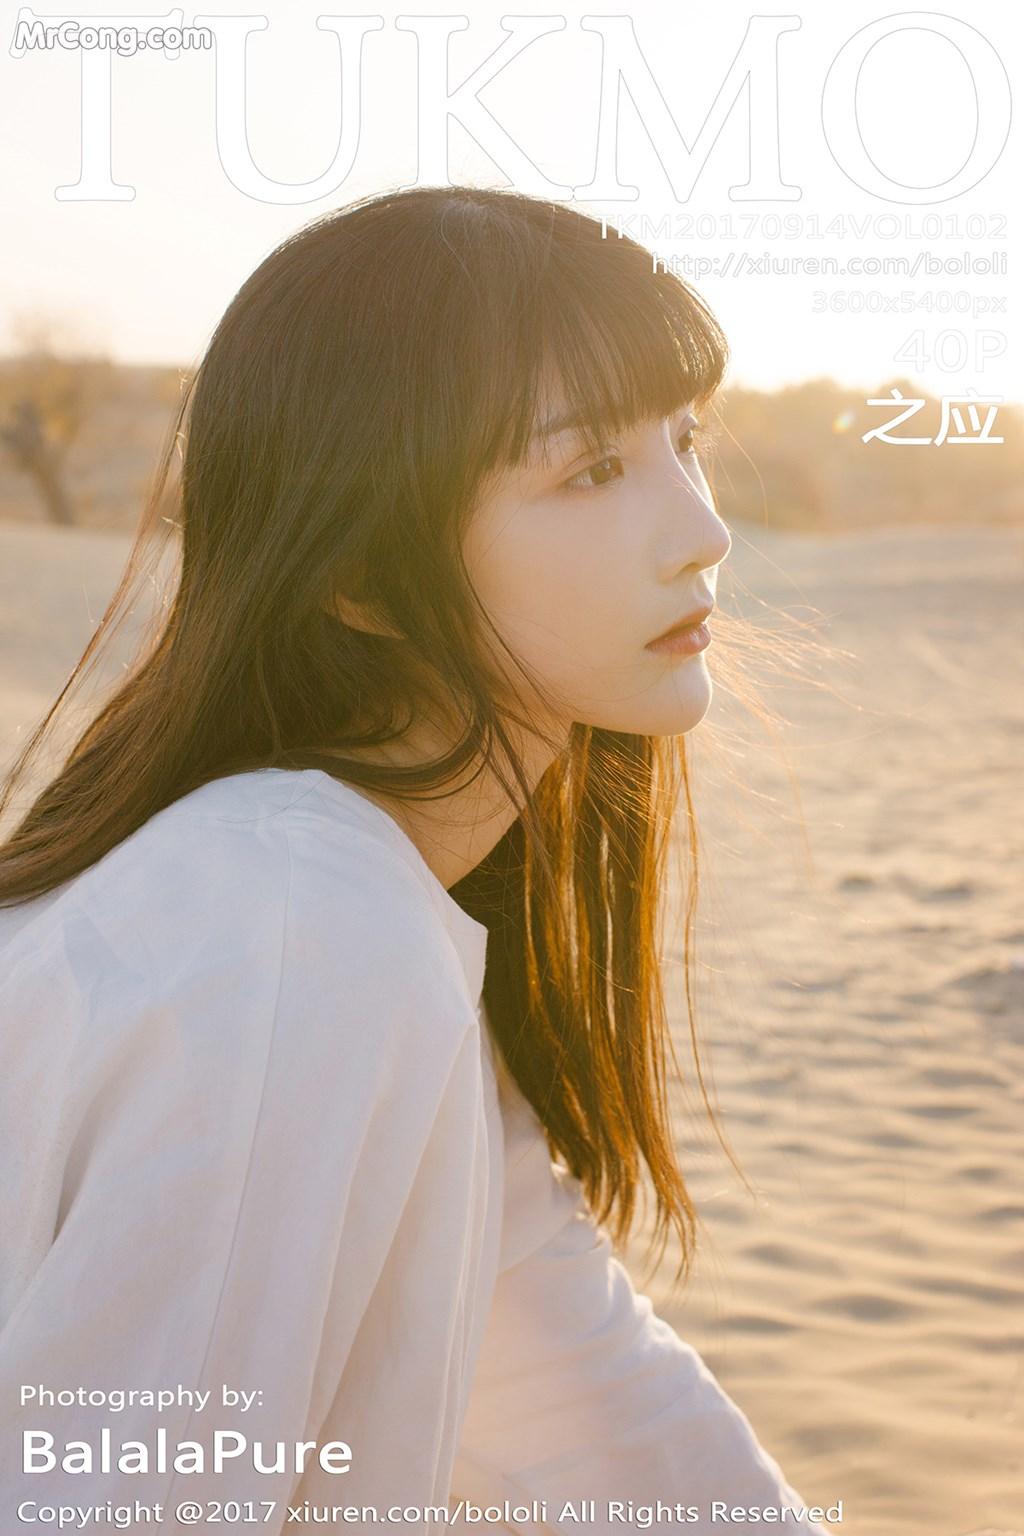 Tukmo Vol.102: Người mẫu Zhi Ying (之应) (41 ảnh)